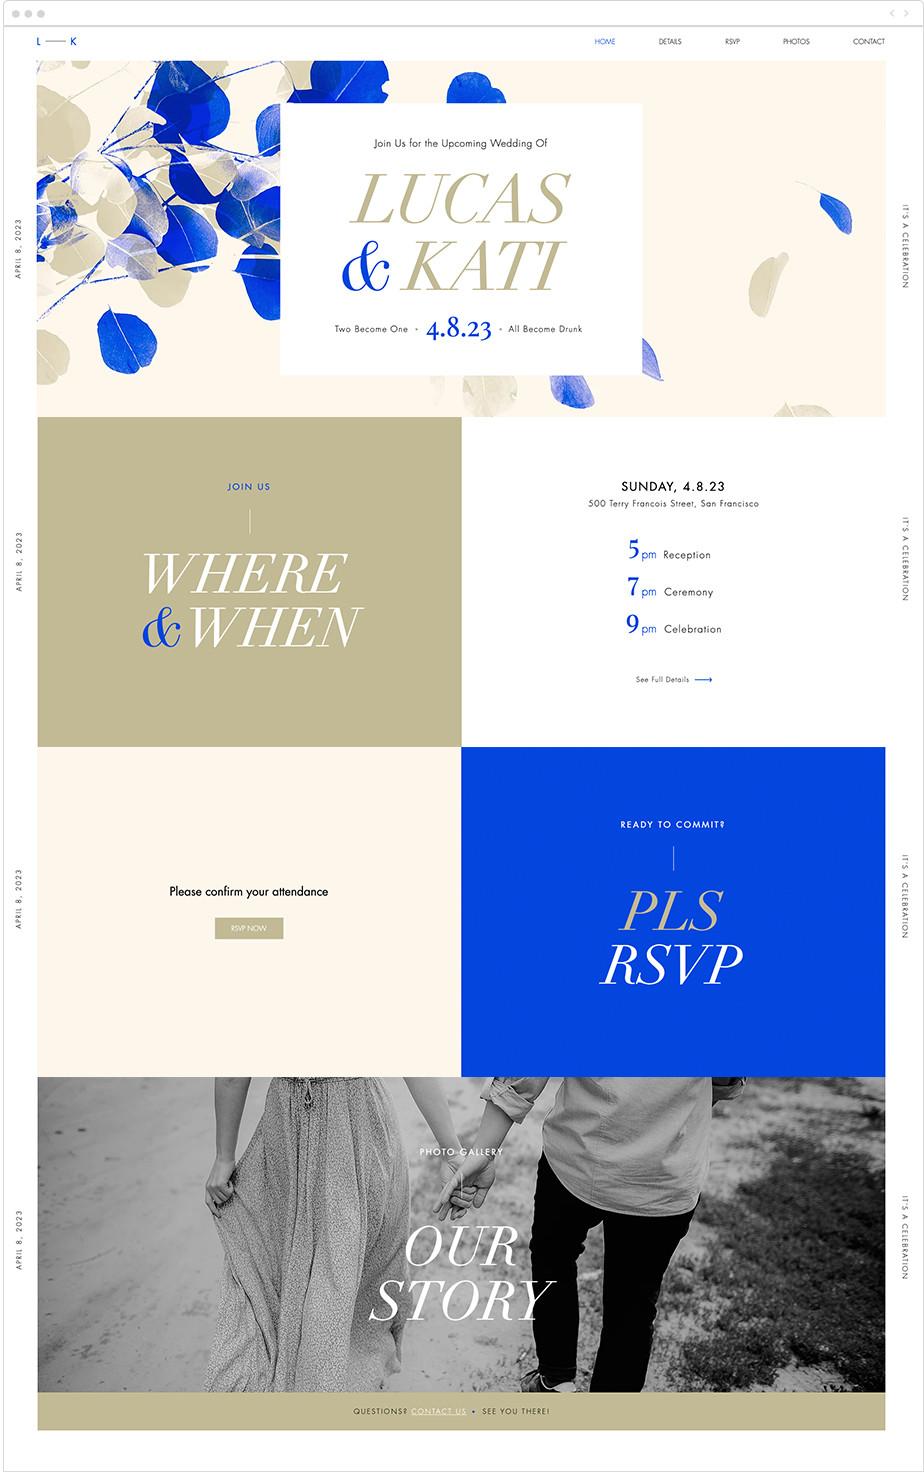 Plantilla de Wix para web de boda